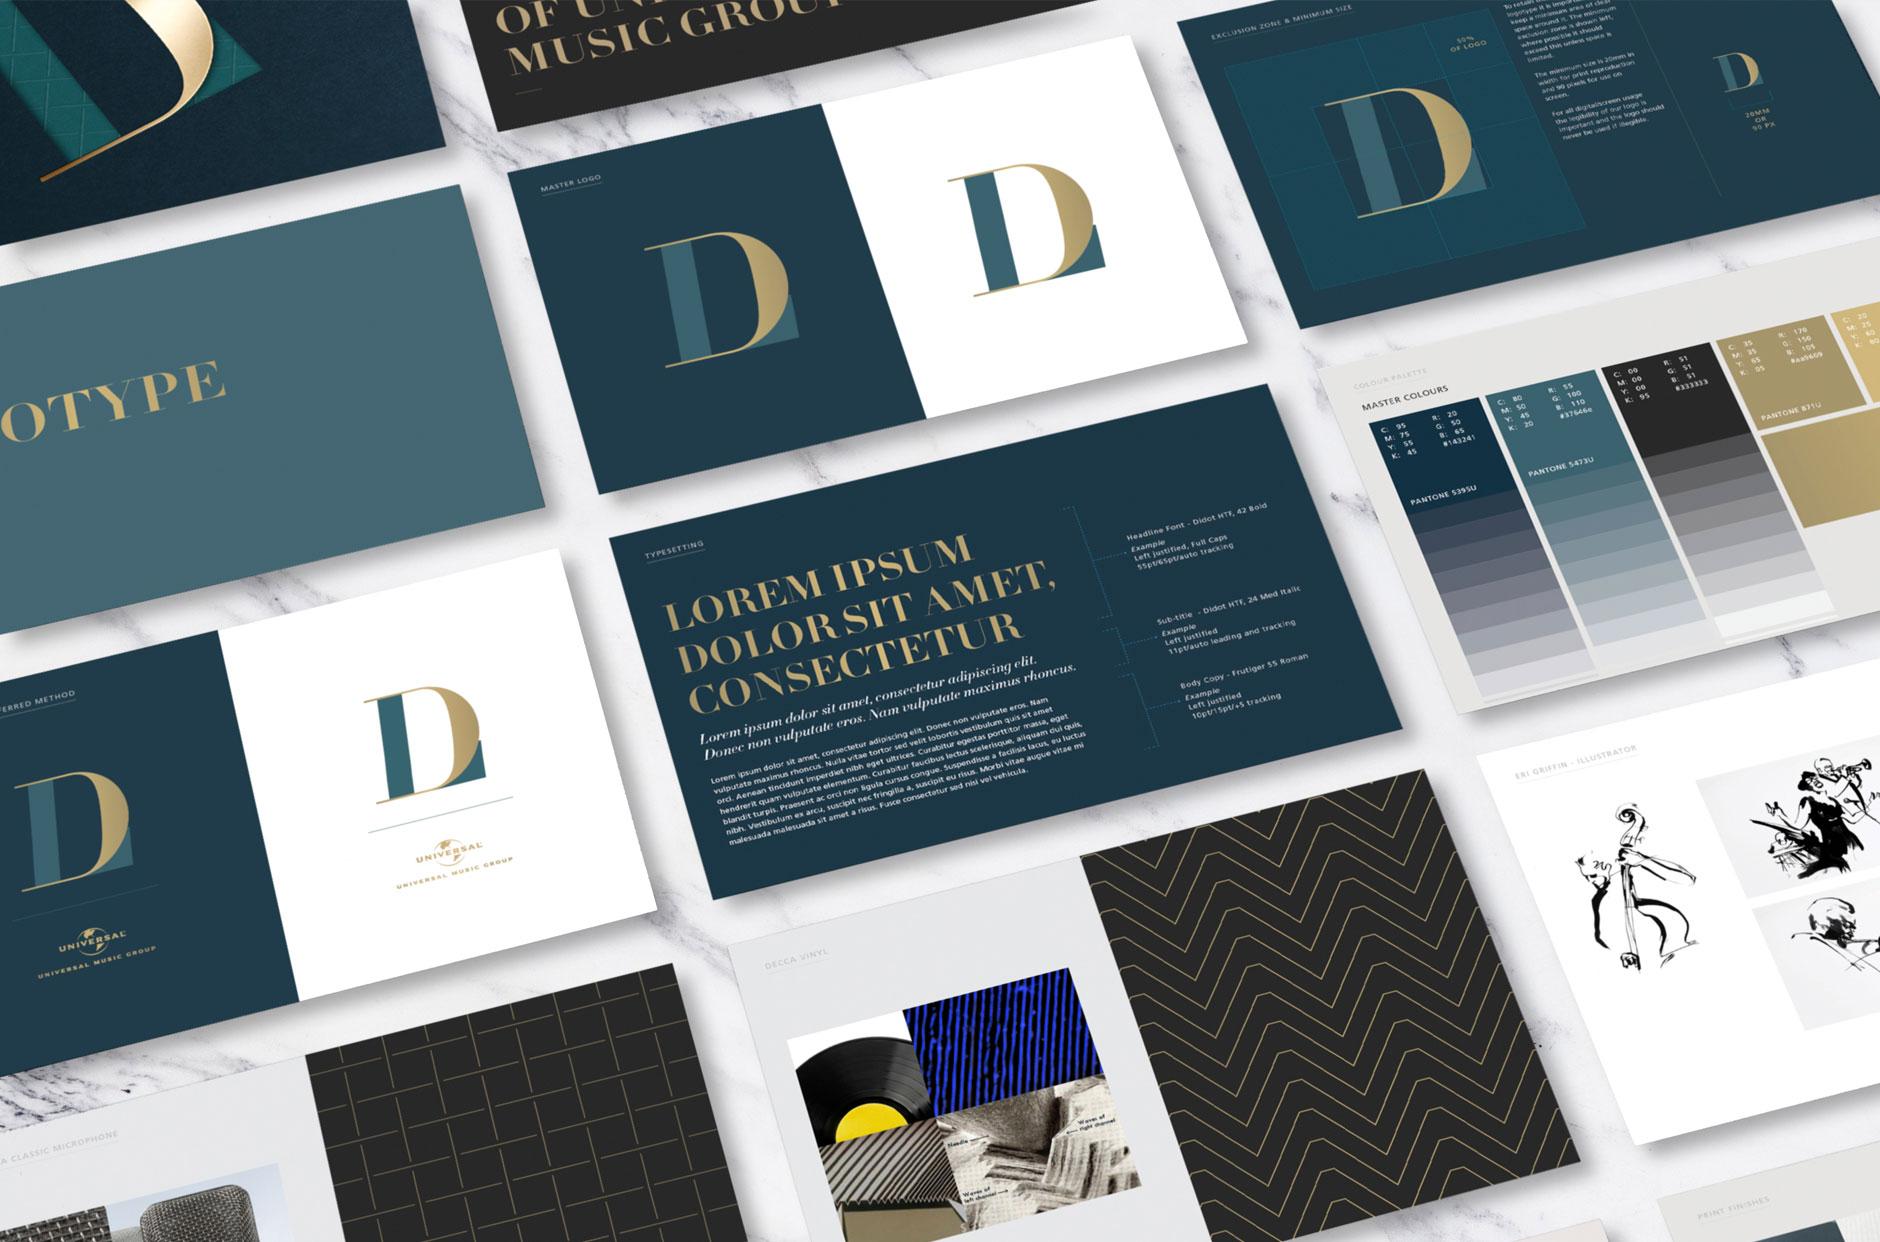 Decca_Luxe_guides